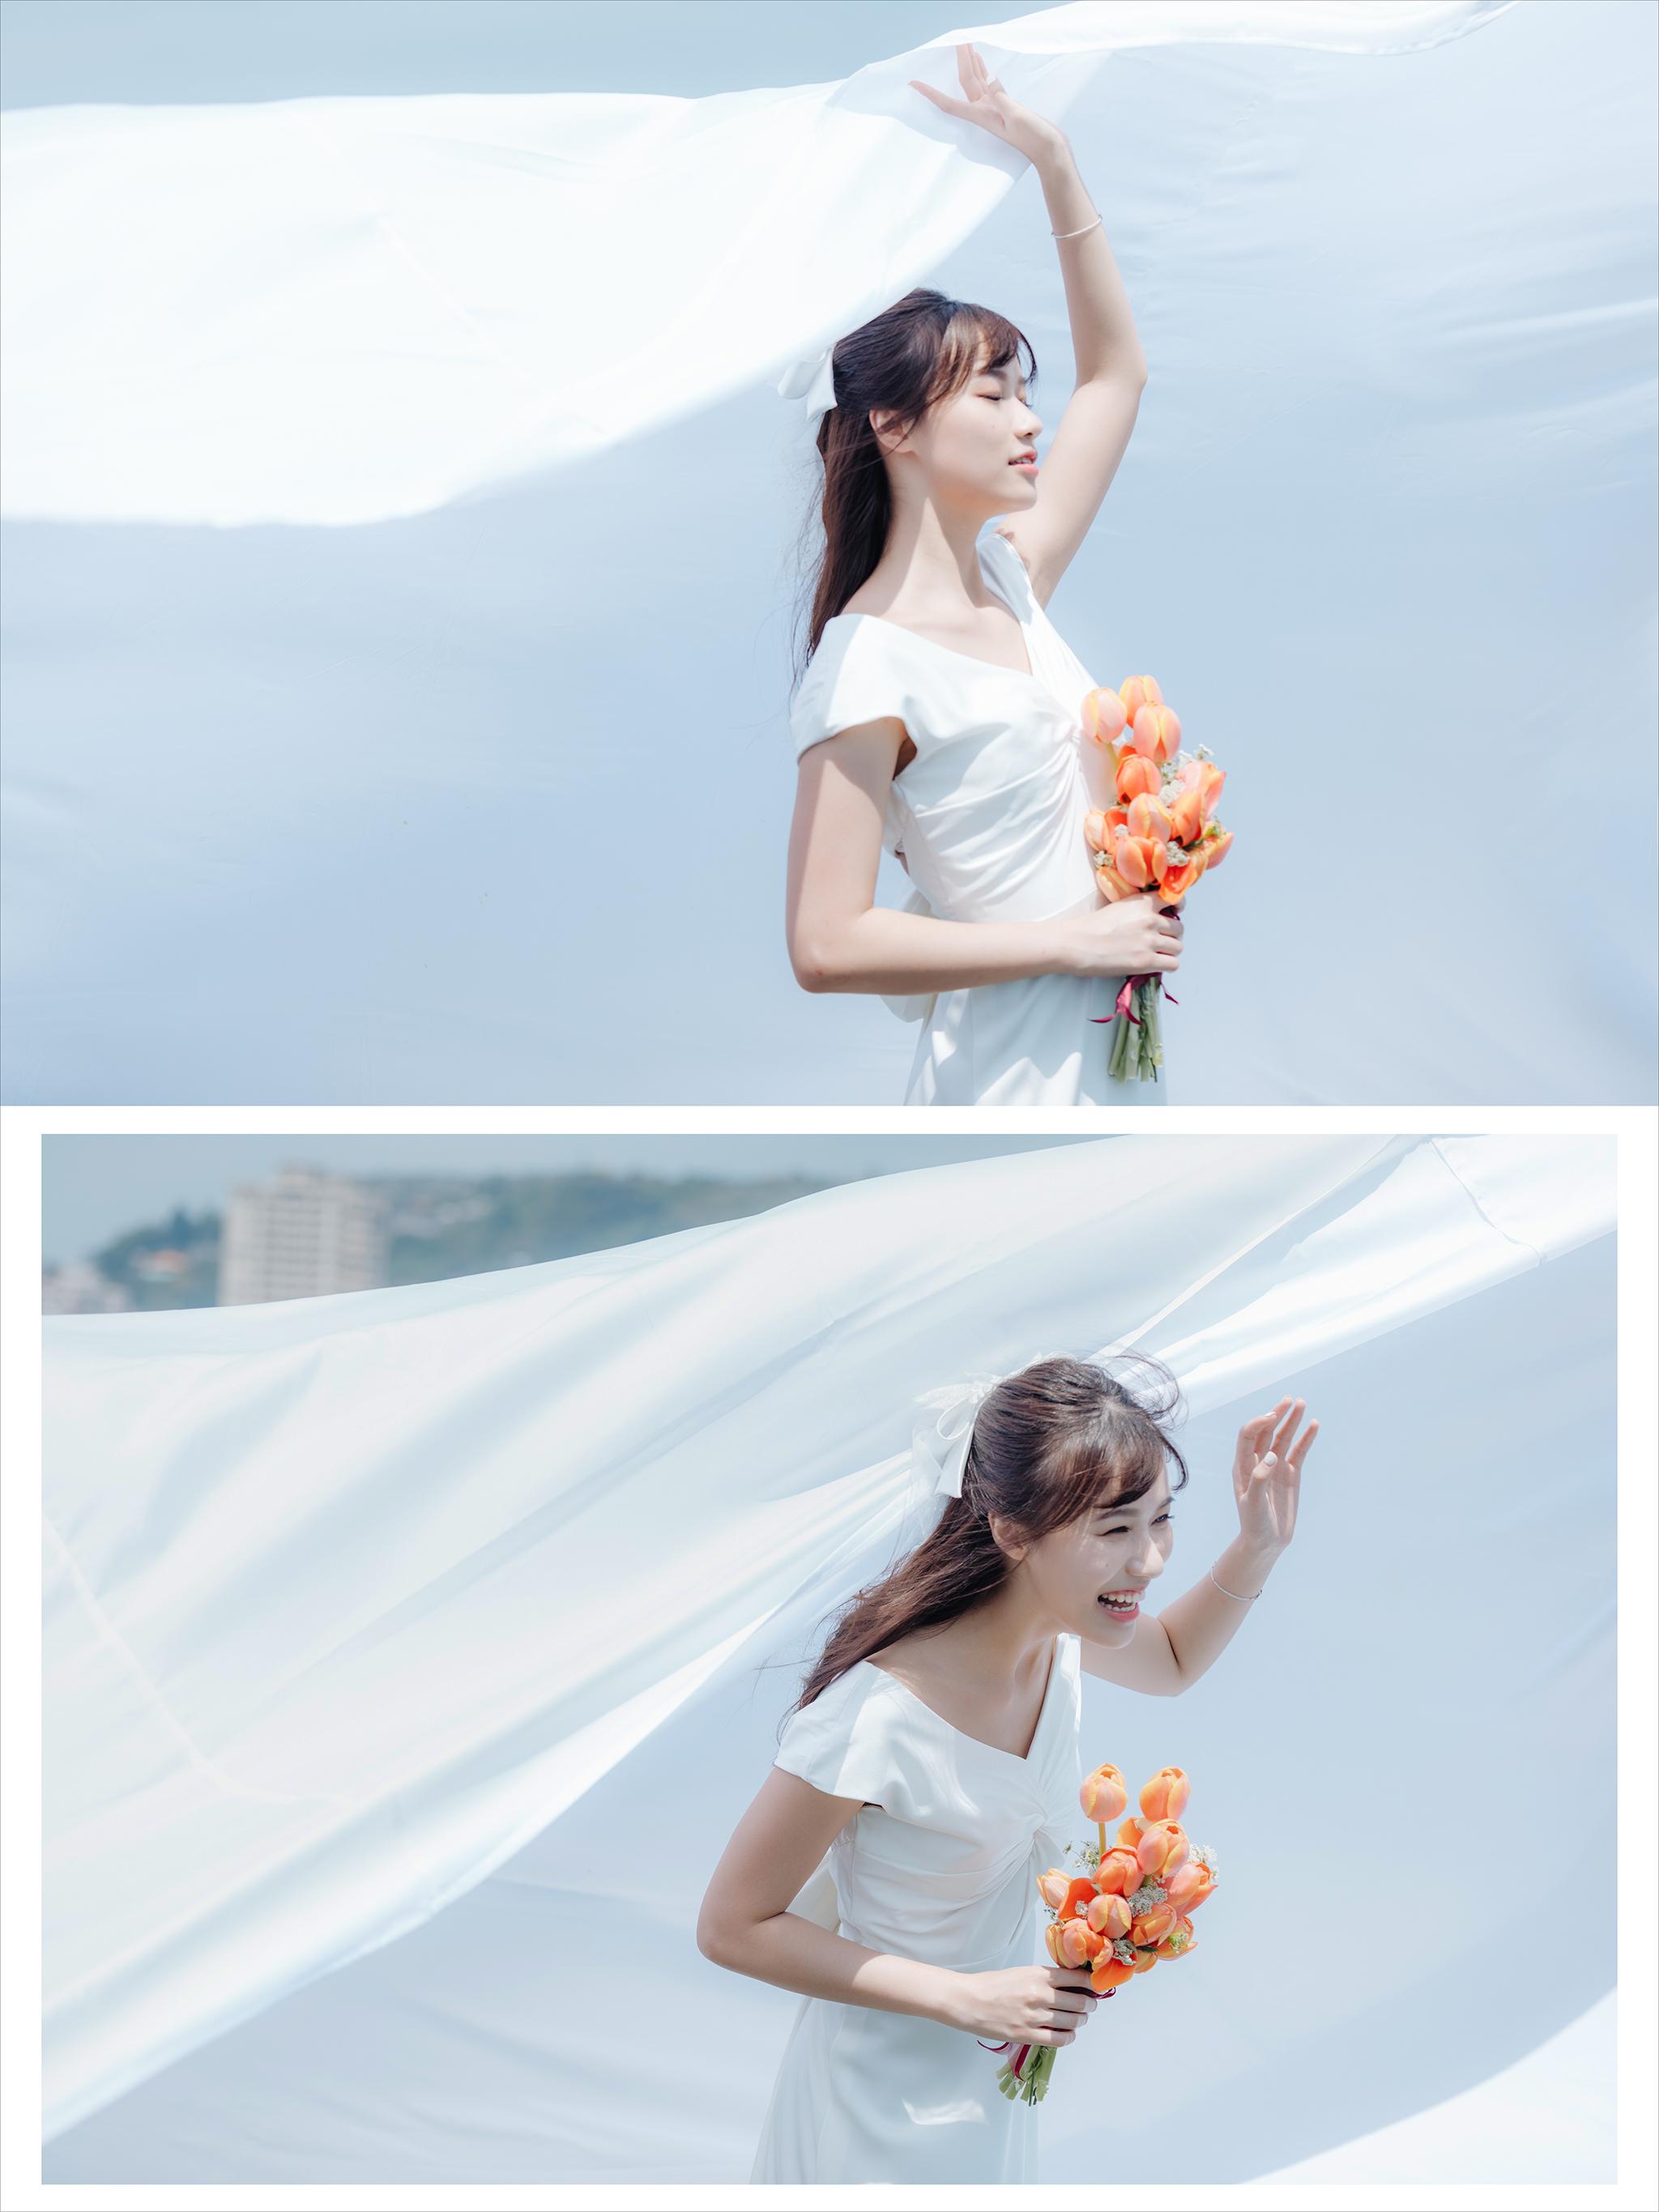 50081458083 853ed56ccc o - 【自主婚紗】+Mei+